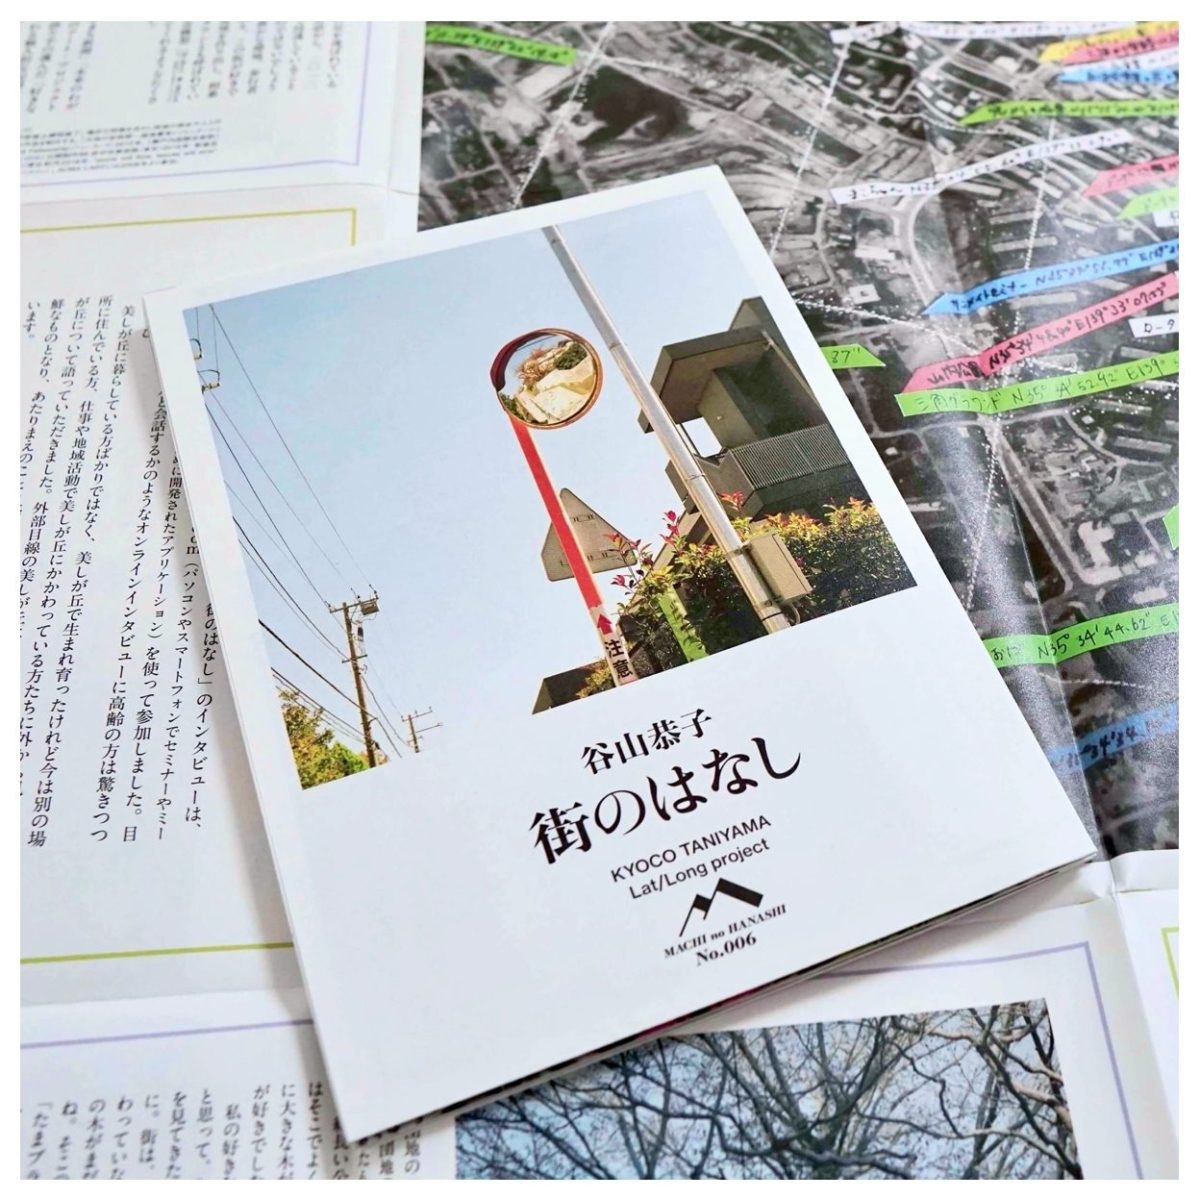 machinohanashi 街のはなし vol.6